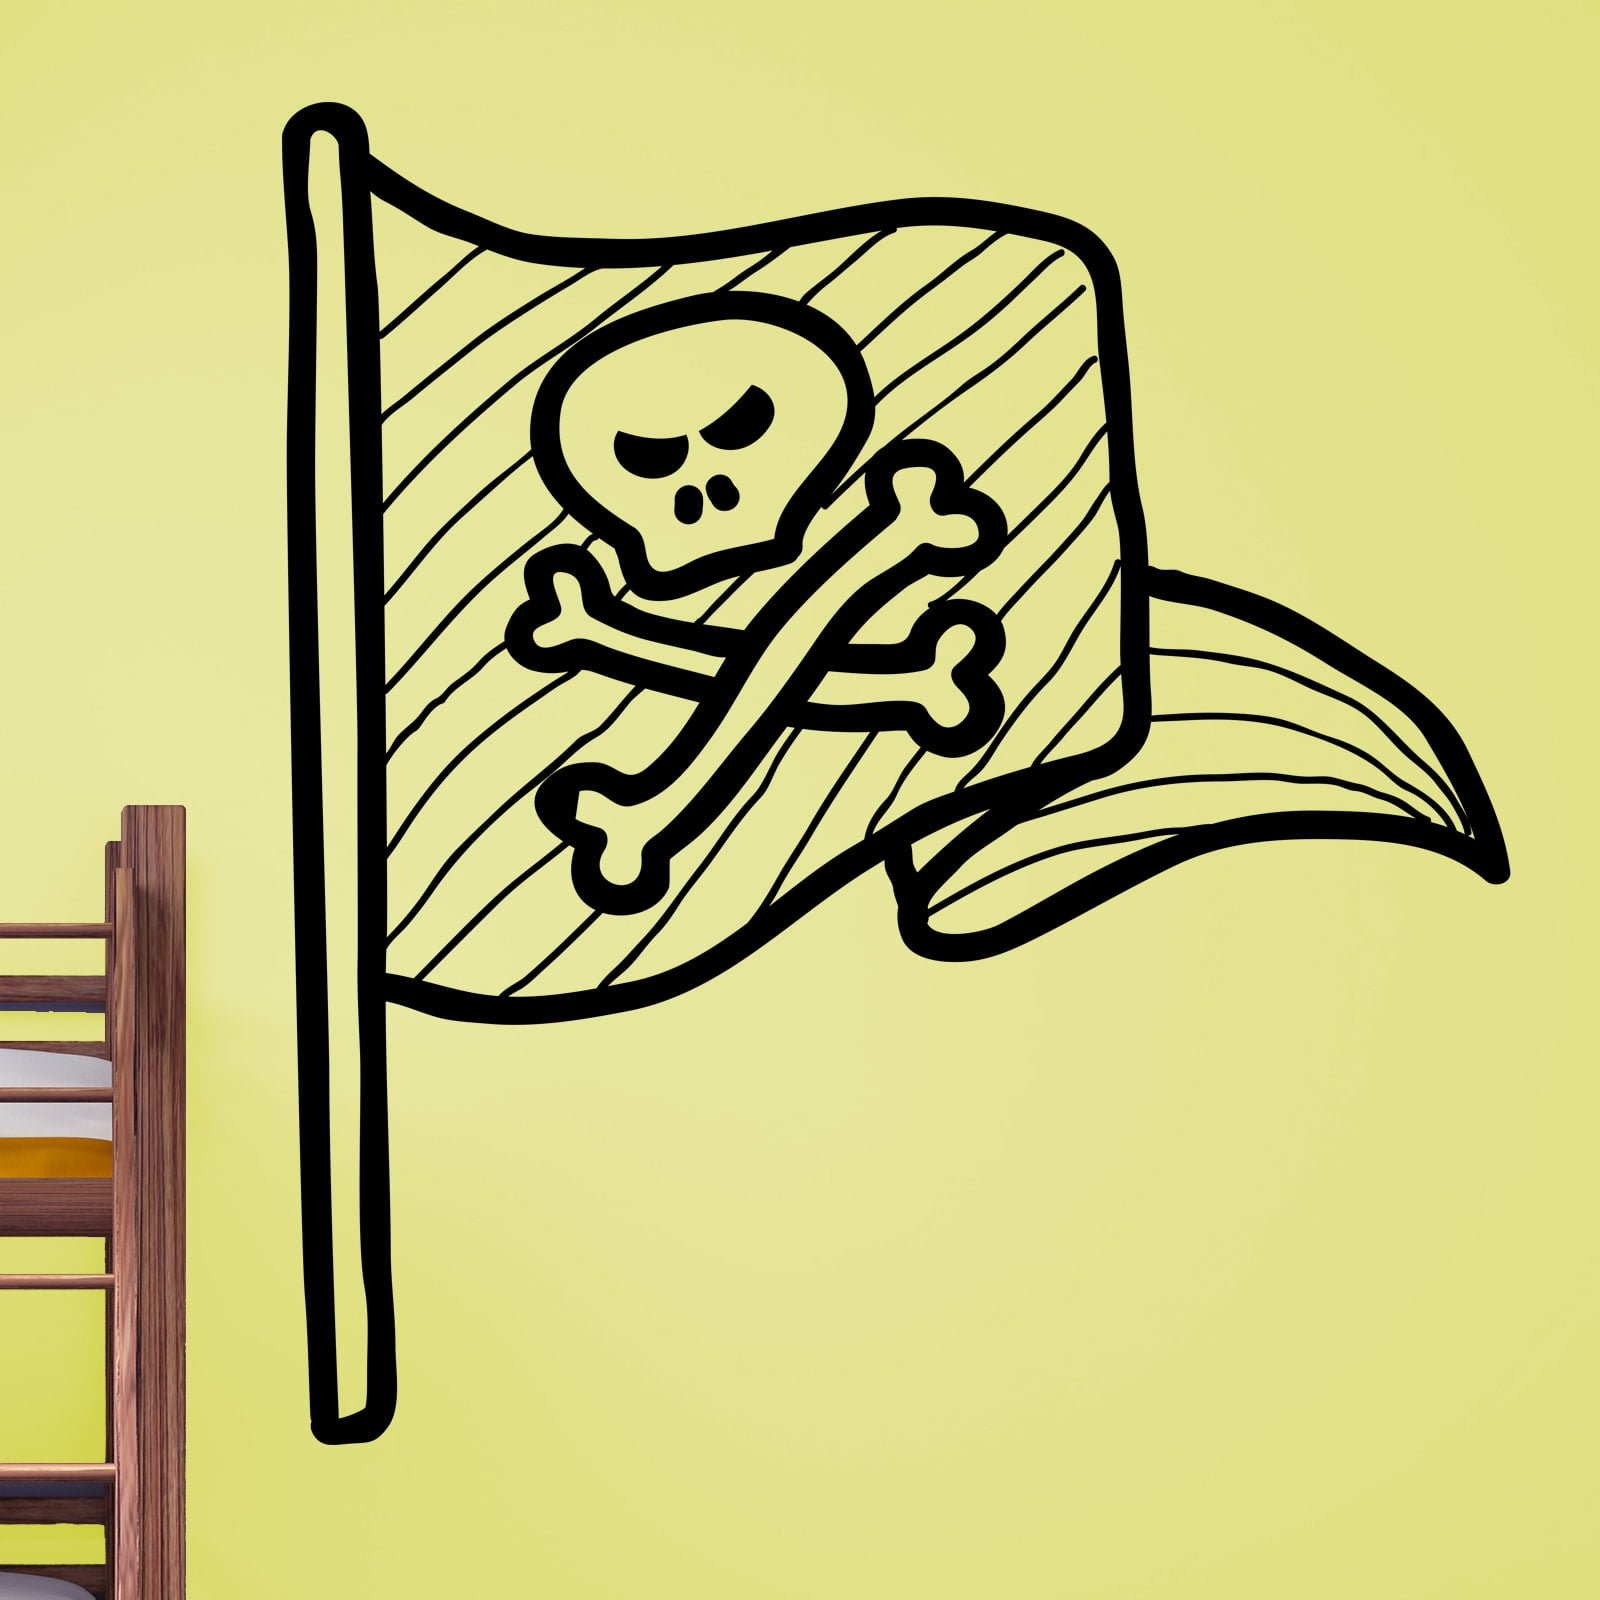 Cartoon Pirate Flag Kids Wall Sticker - World of Wall Stickers